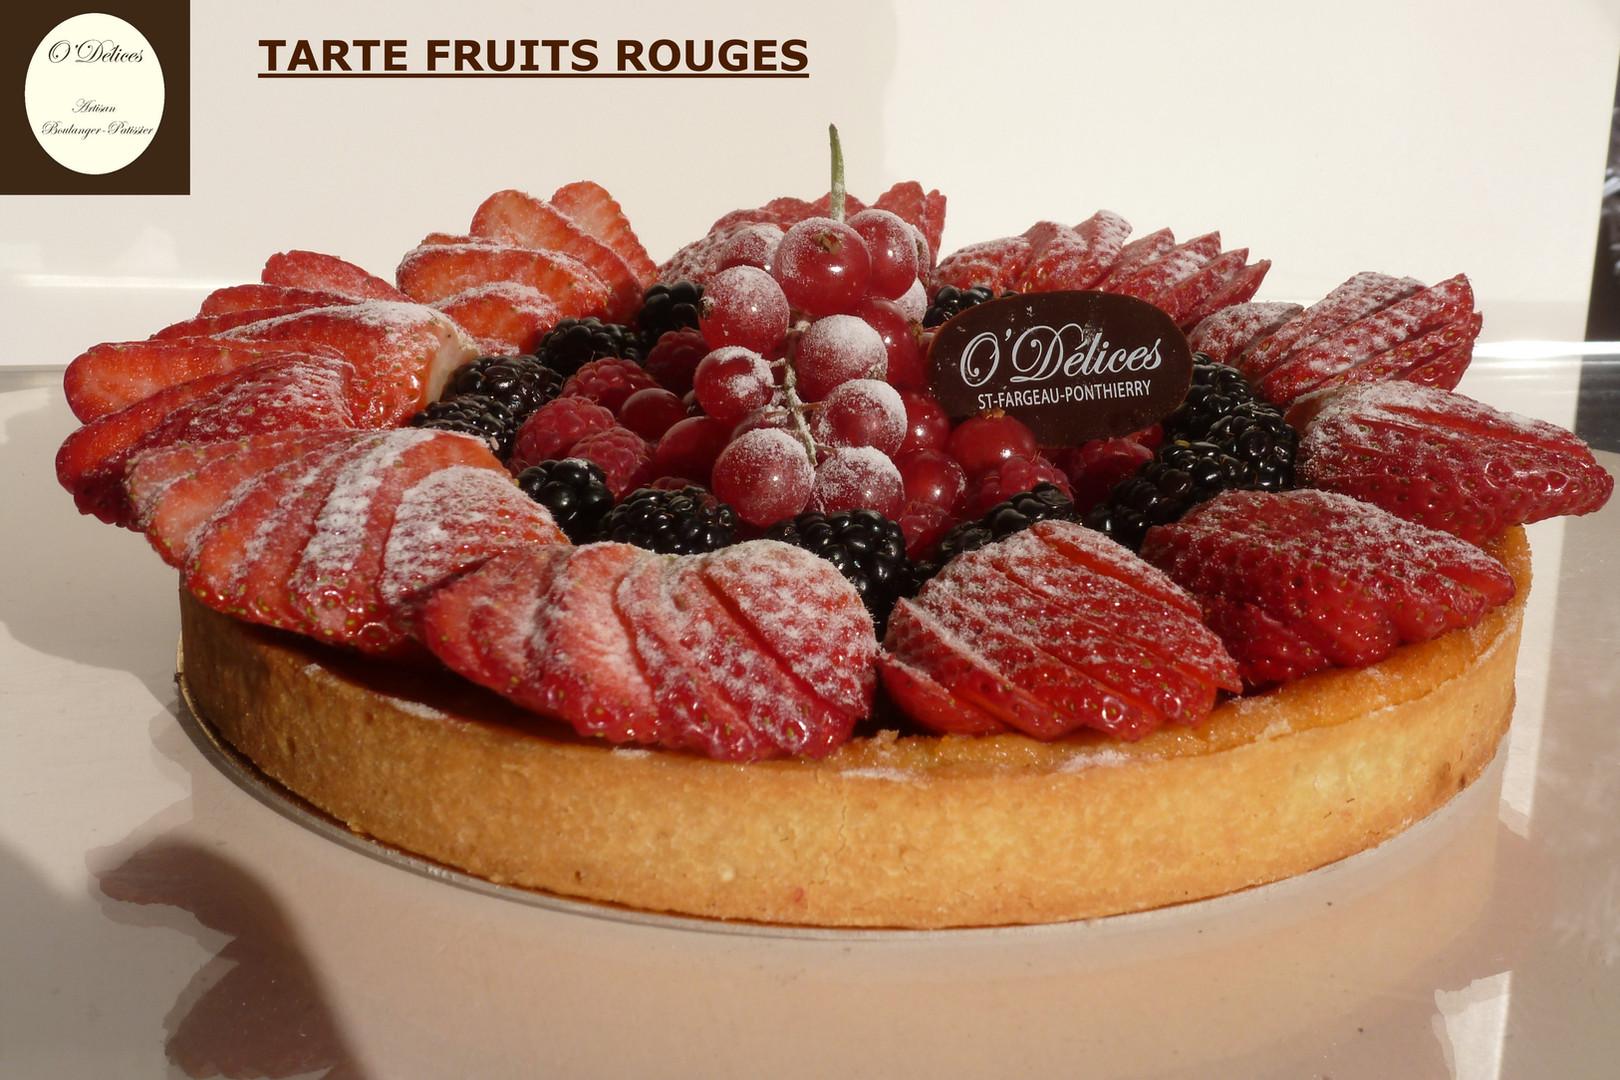 TARTE FRUITS ROUGES